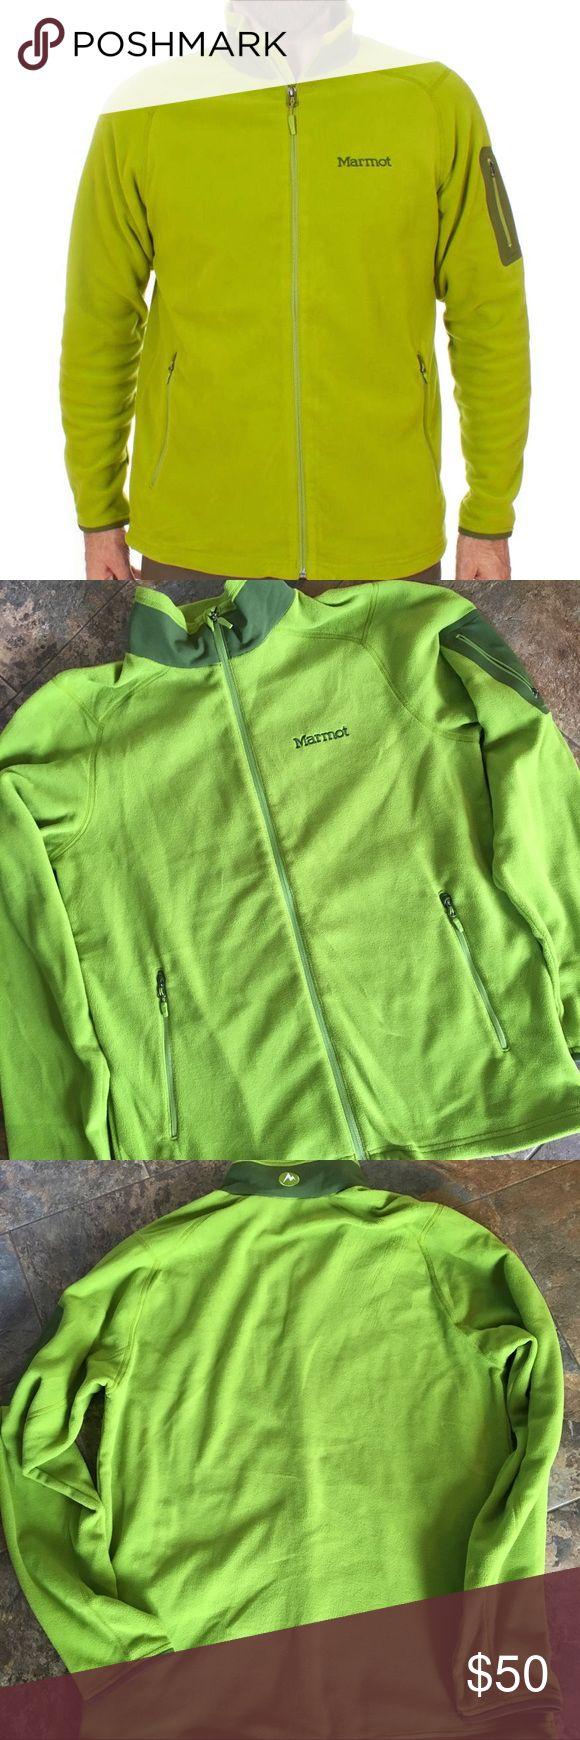 •Marmot• Reactor Fleece Jacket Green Lichen Mens M